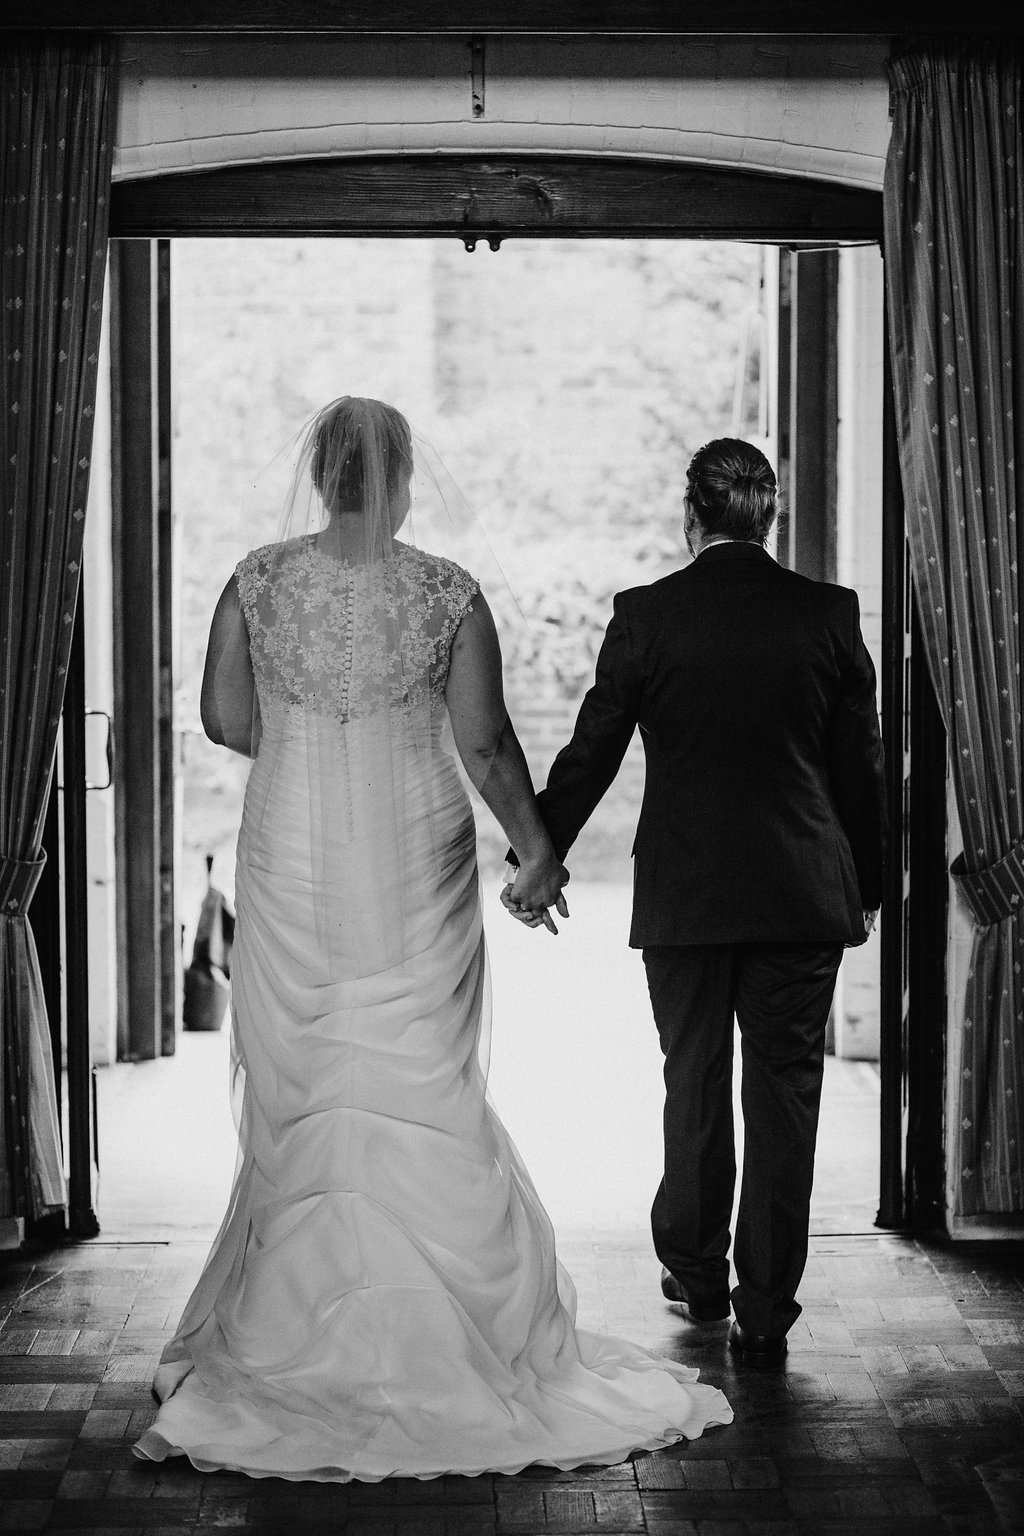 Your_Wedding_Day_0169.jpg